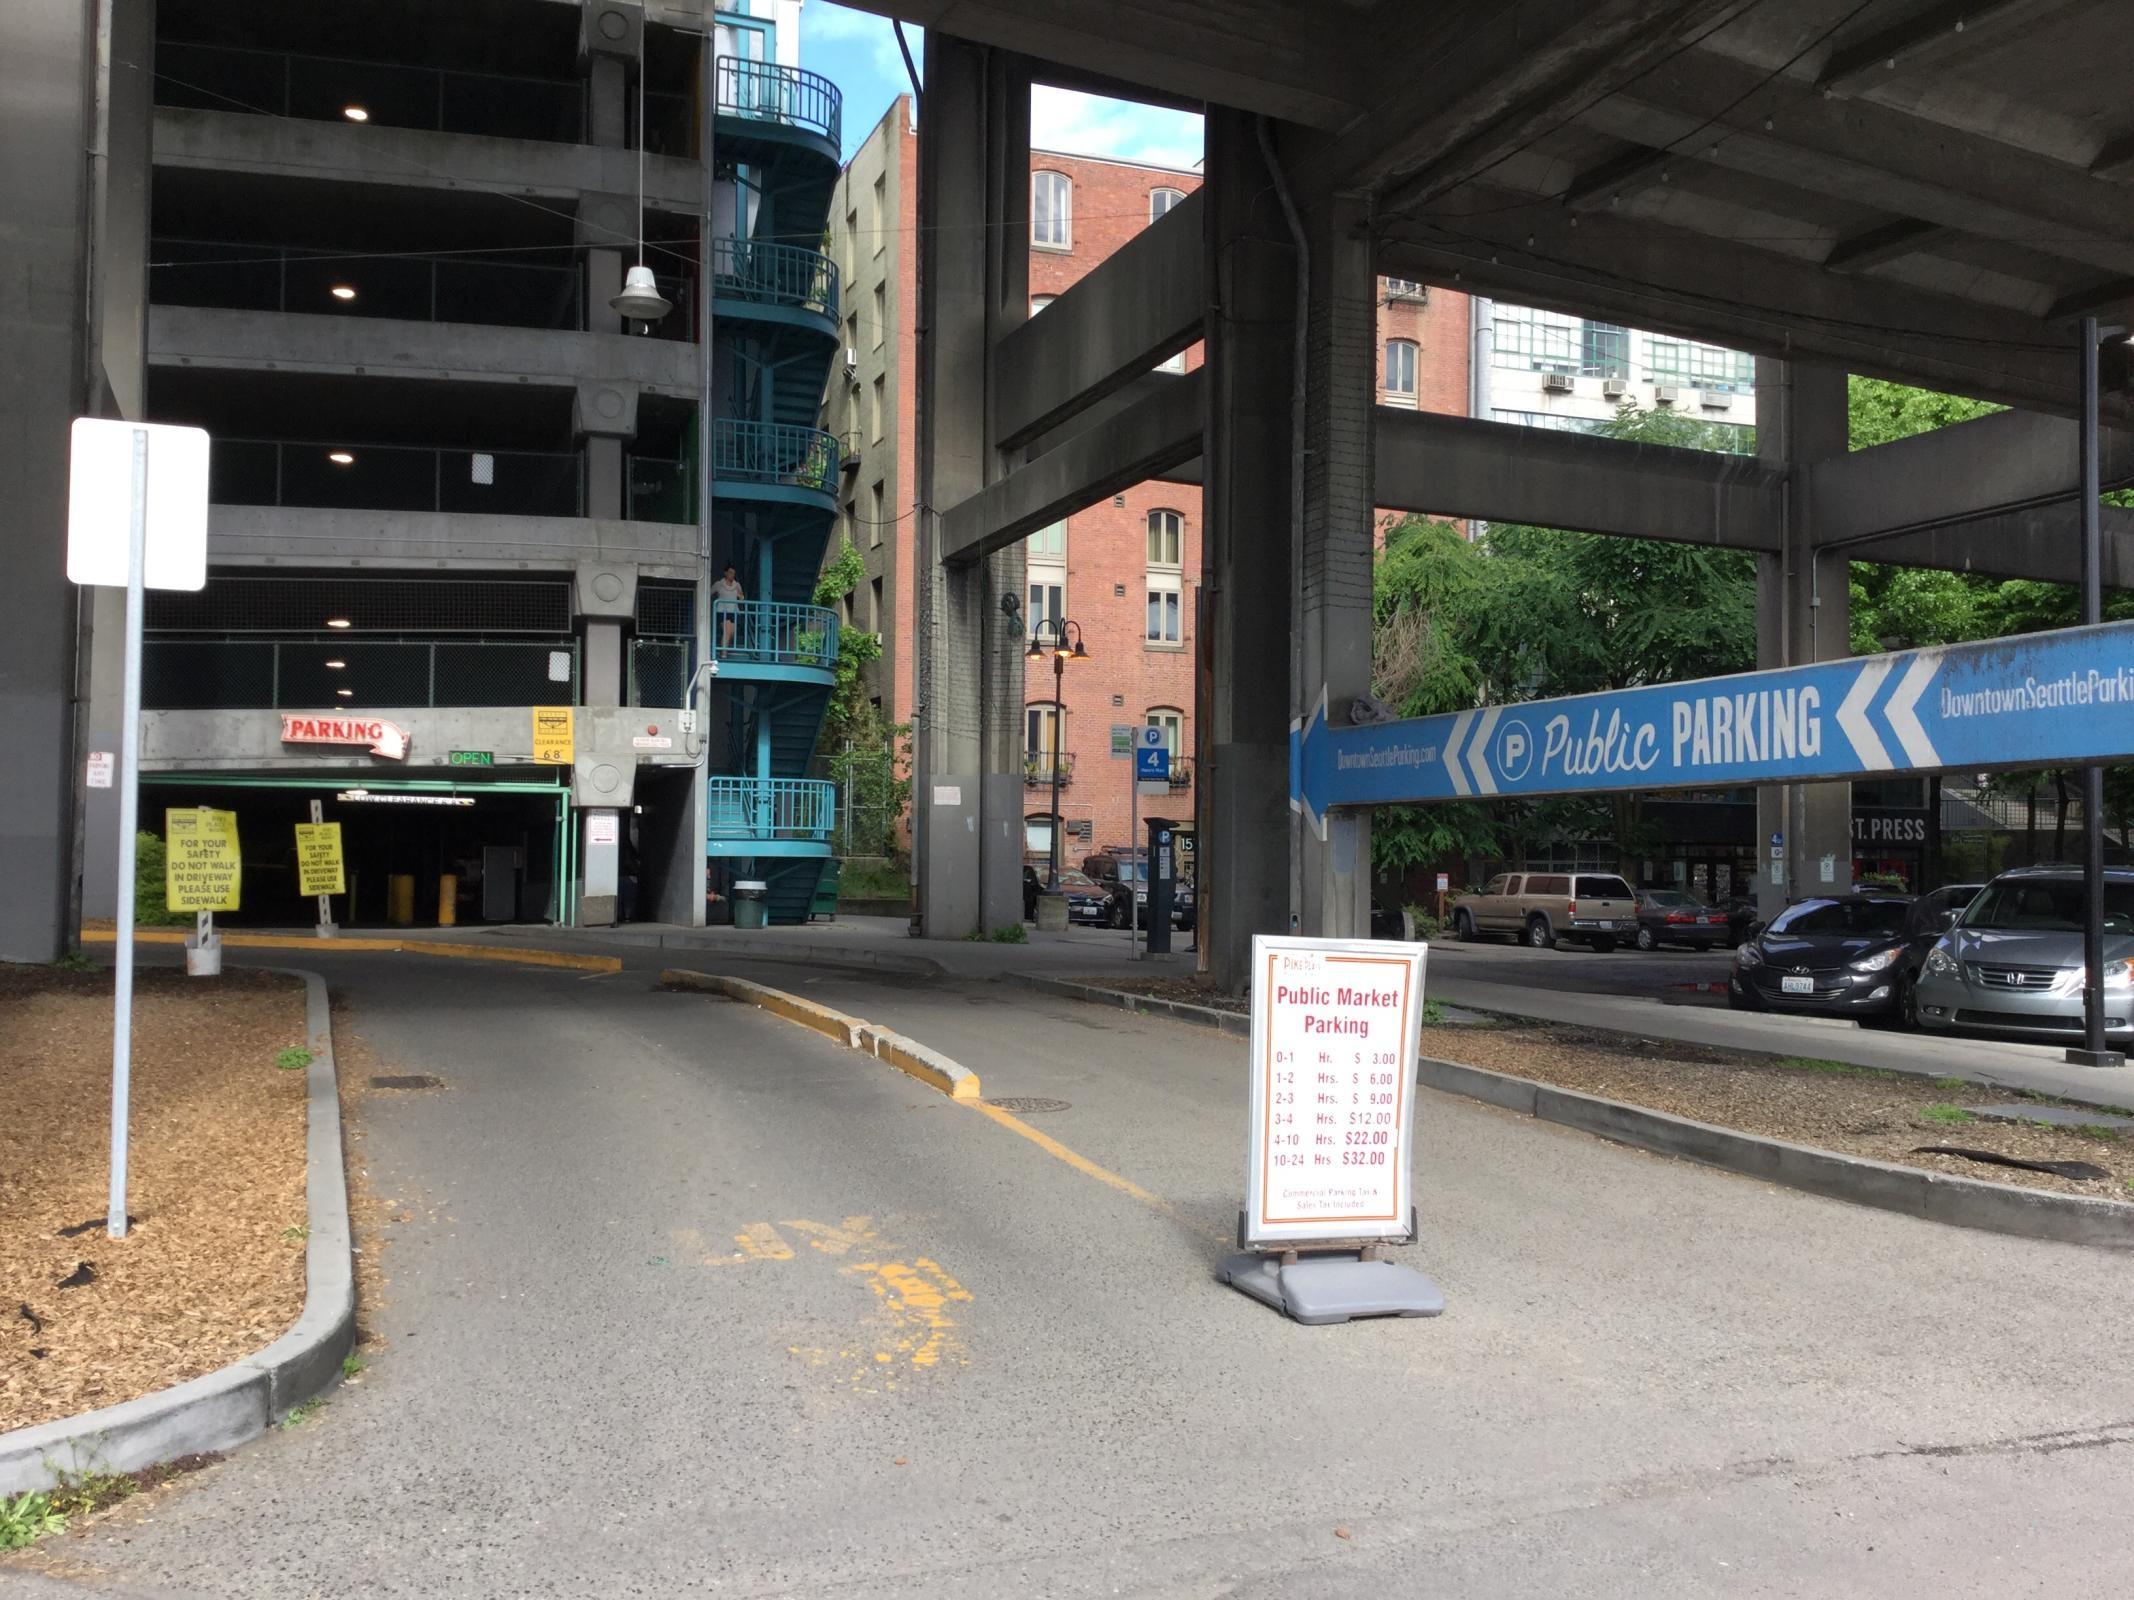 Public Market Parking Garage Parking in Seattle ParkMe